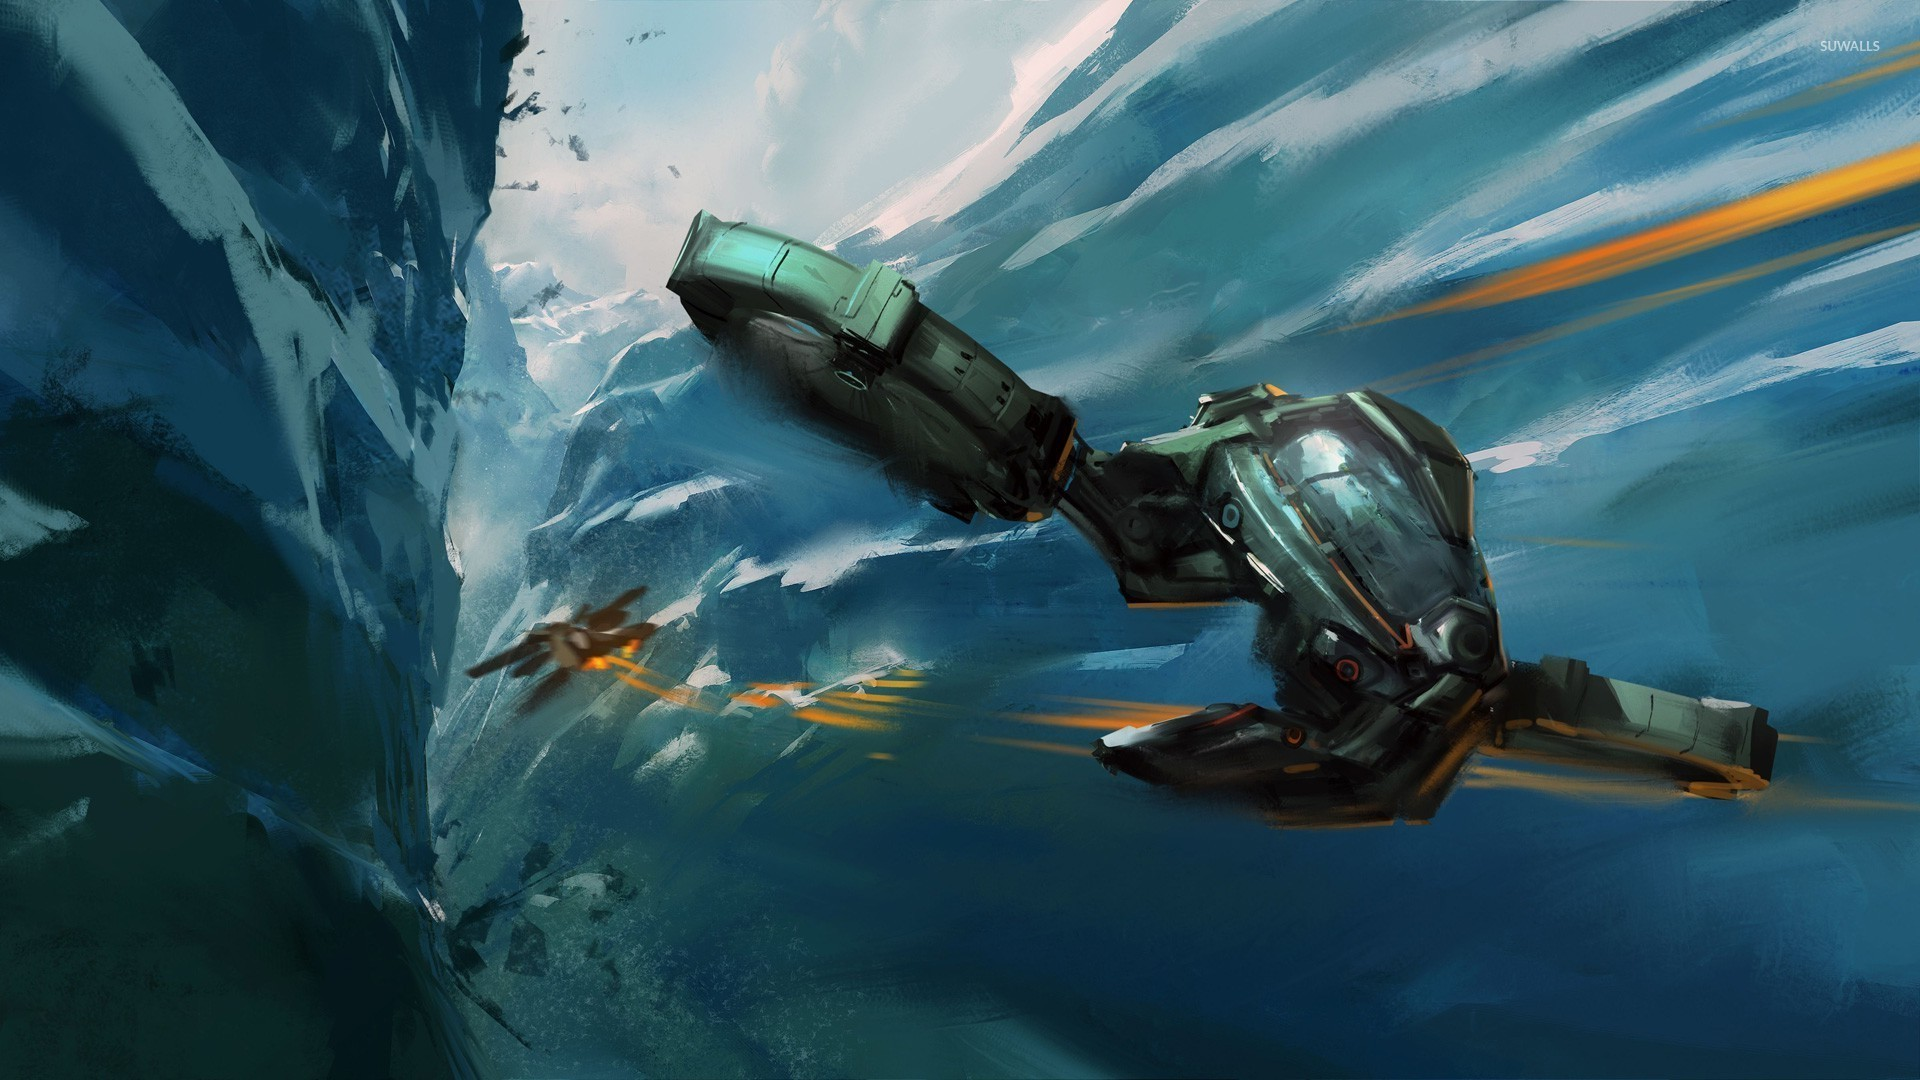 Res: 1920x1080, Spaceship battle wallpaper